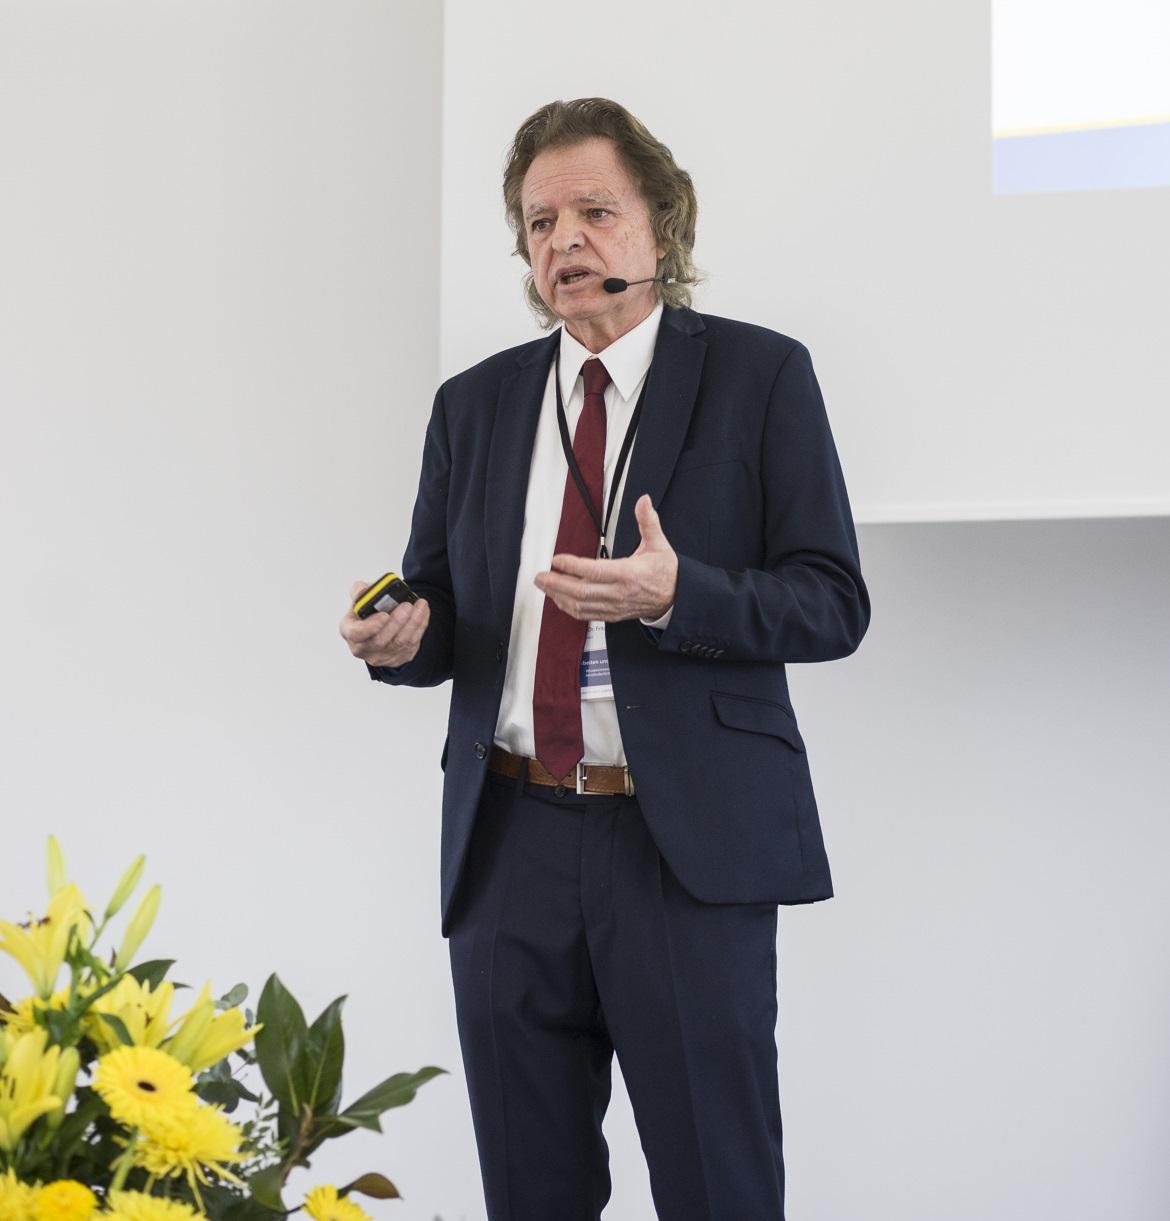 Prof. Fritz Böhle erklärt den Projektansatz von LerndA.